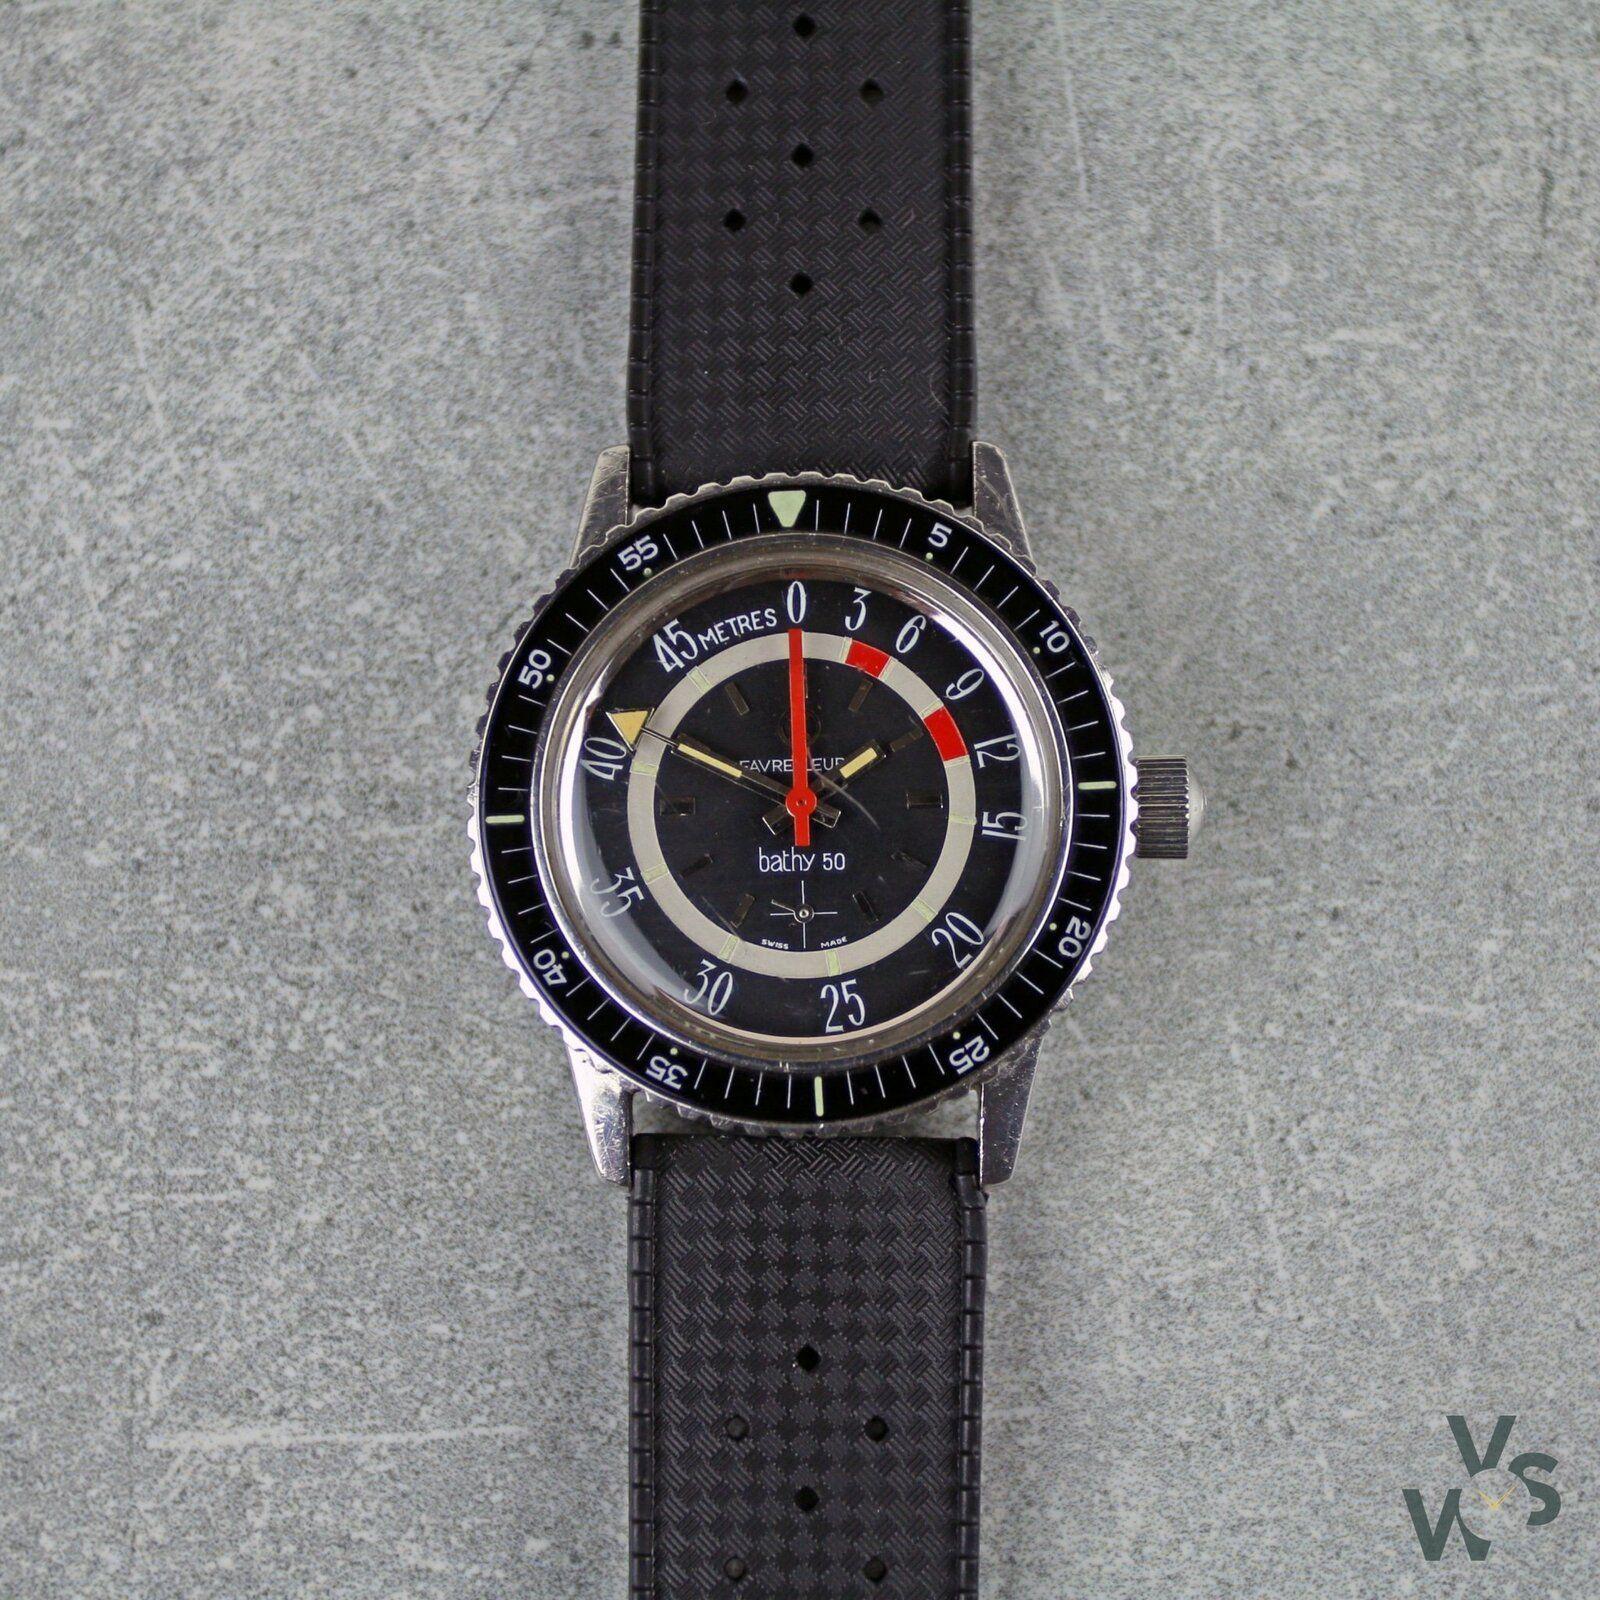 1969-favre-leuba-bathy-50-divers-watch-with-depth-gauge-diver-watches-vintage-specialist-766_2...jpg